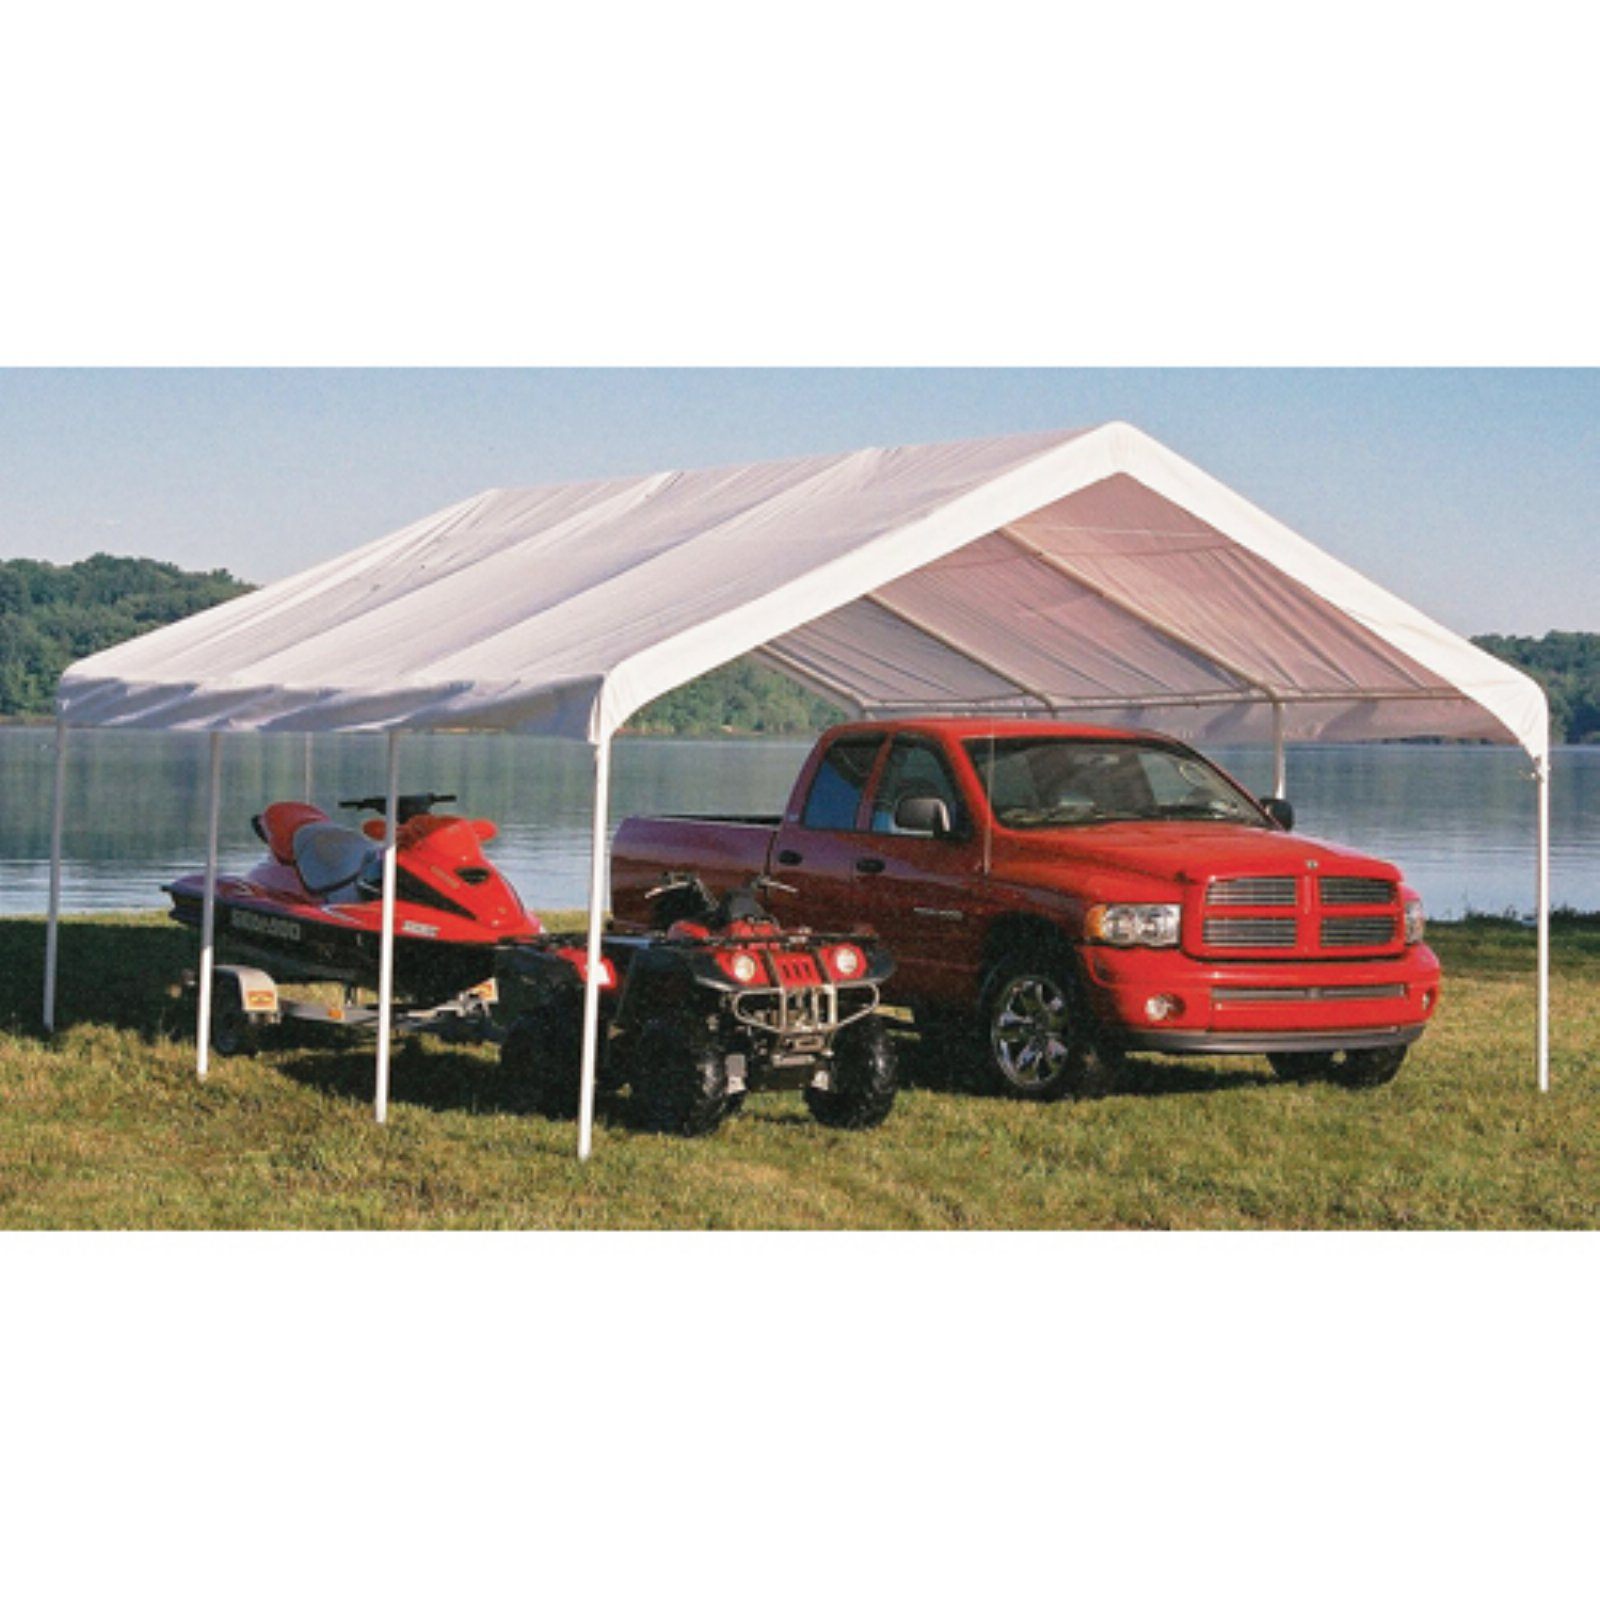 Super Max 18' x 20' White Premium Canopy by ShelterLogic